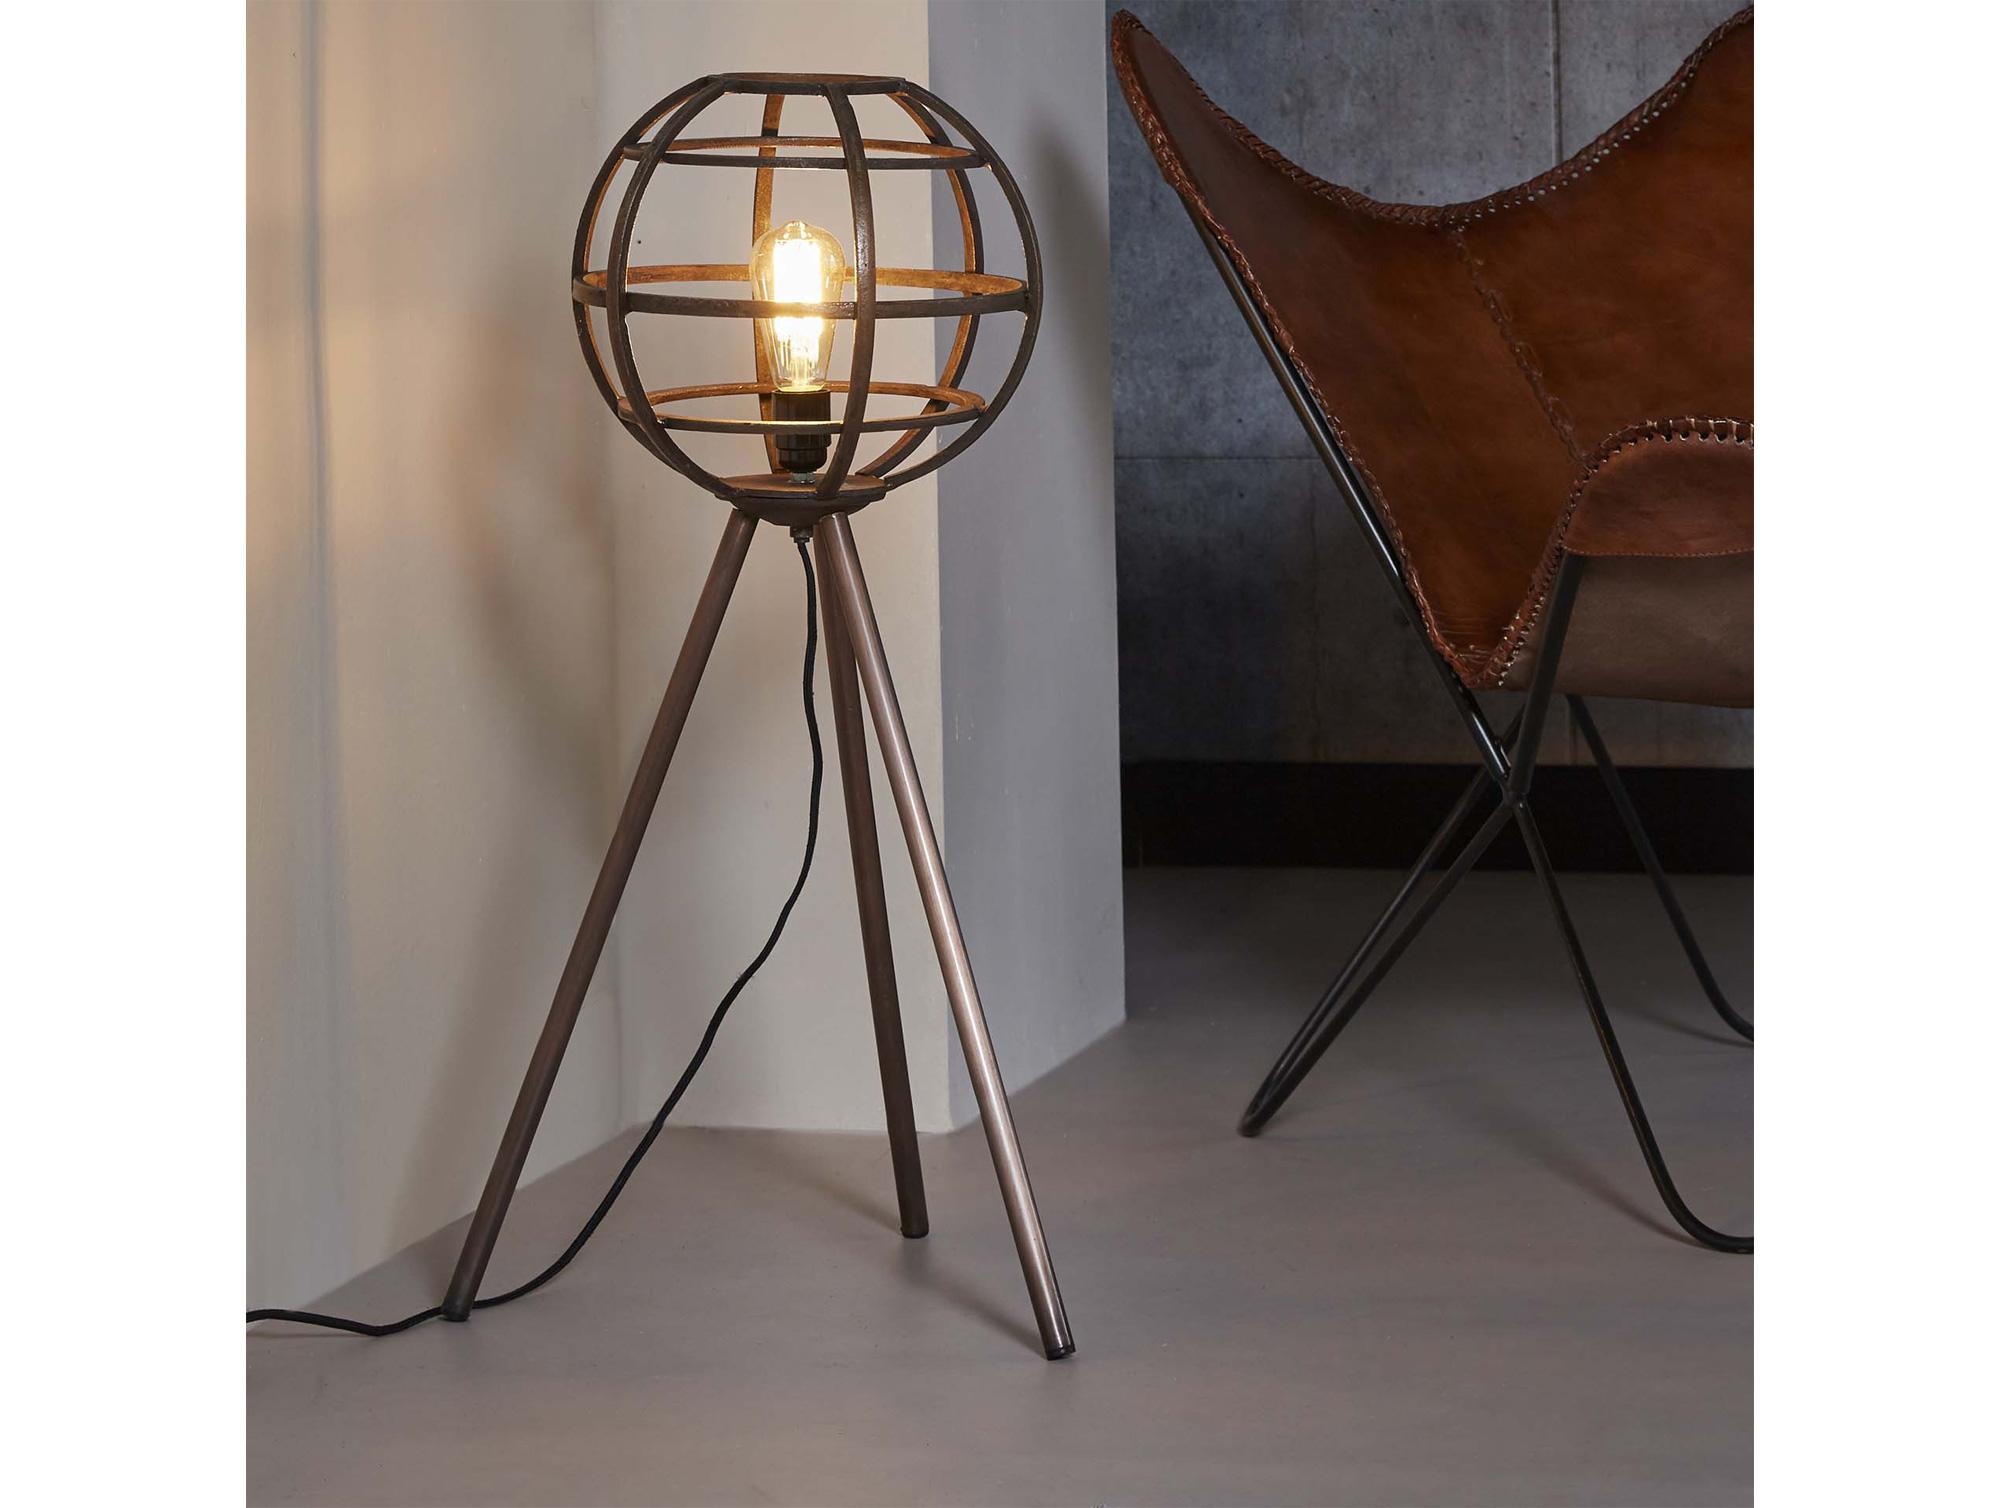 Roli Stehlampe Hohe 83 Cm